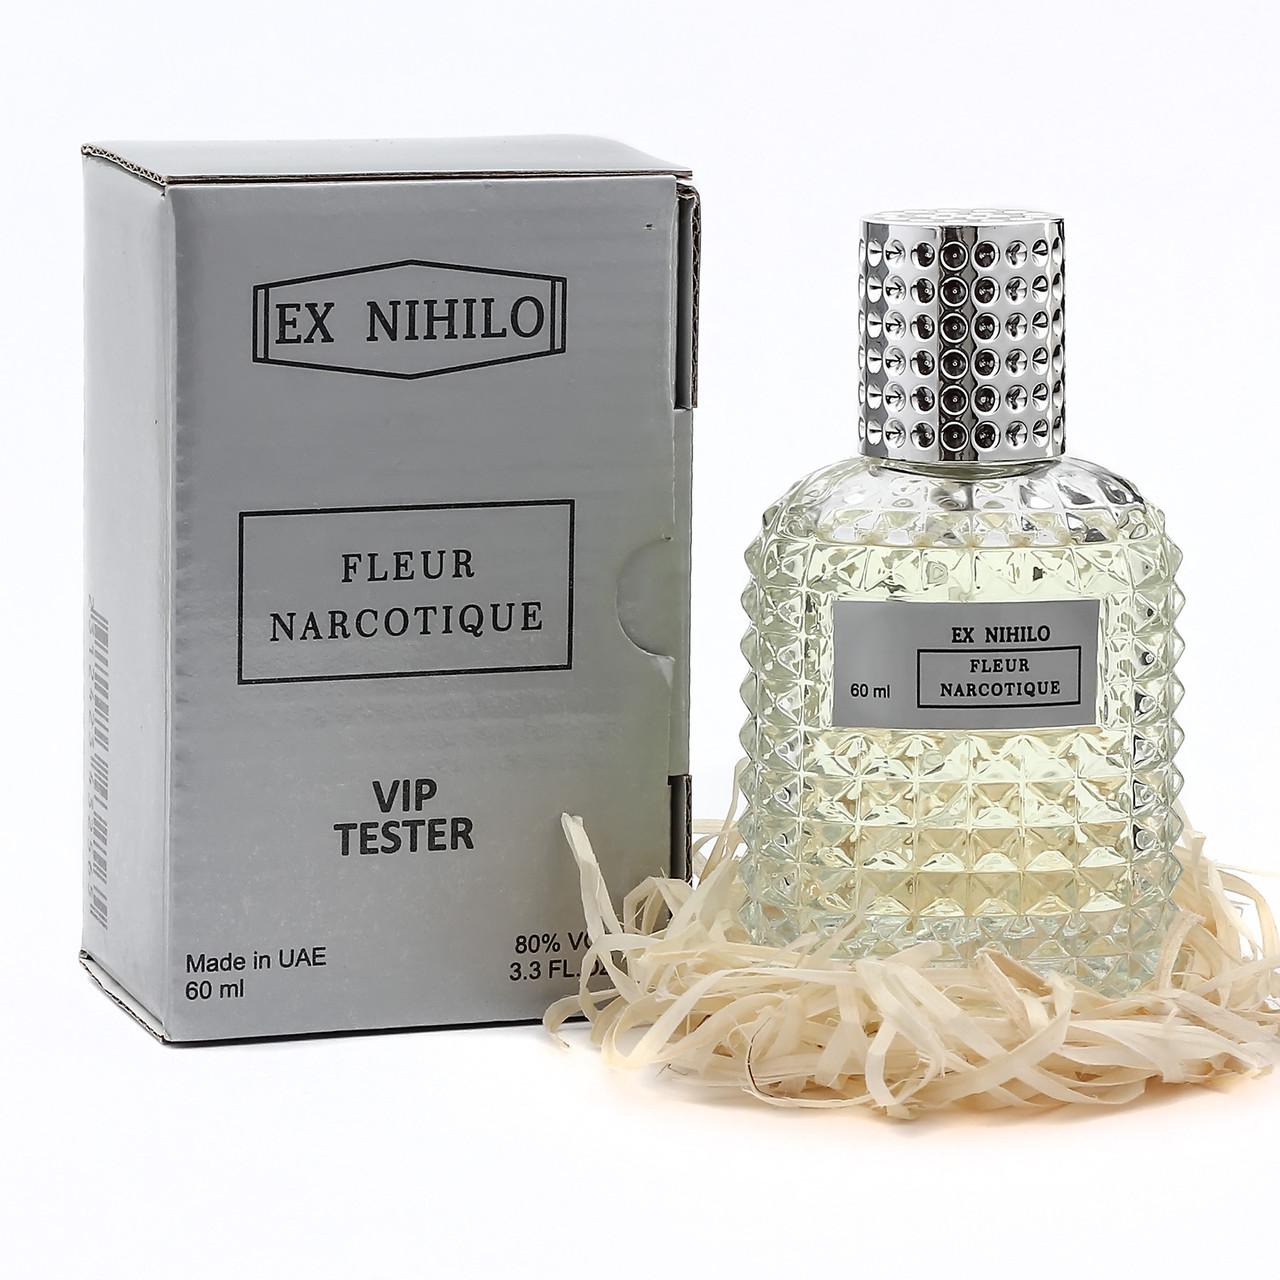 Ex Nihilo Fleur Narcotique TESTER VIP, унисекс, 60 мл